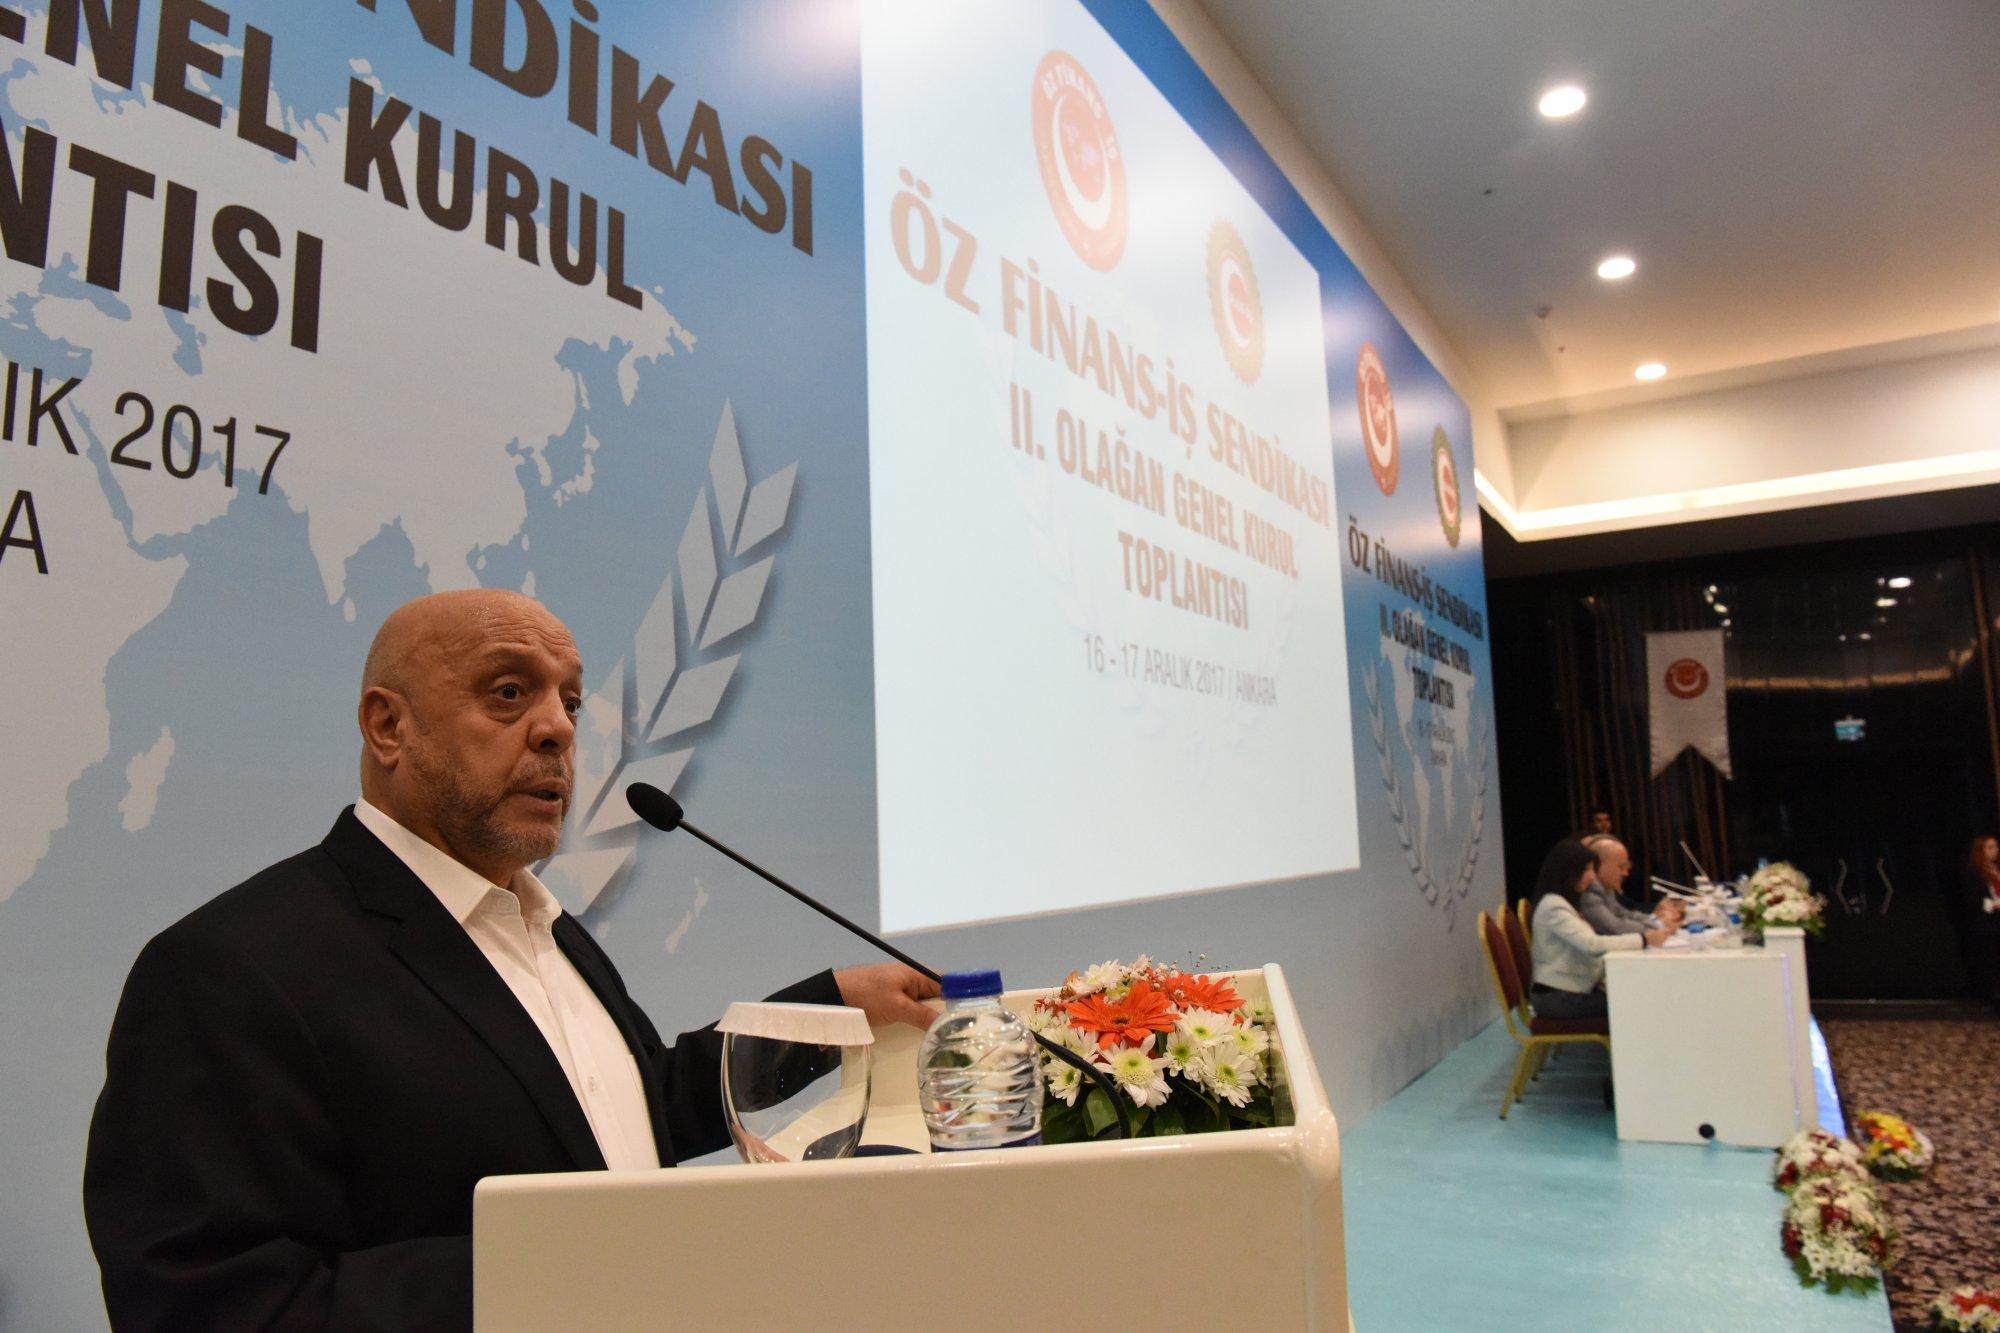 ARSLAN, ÖZ FİNANS-İŞ 2. GENEL KURULU'NA KATILDI